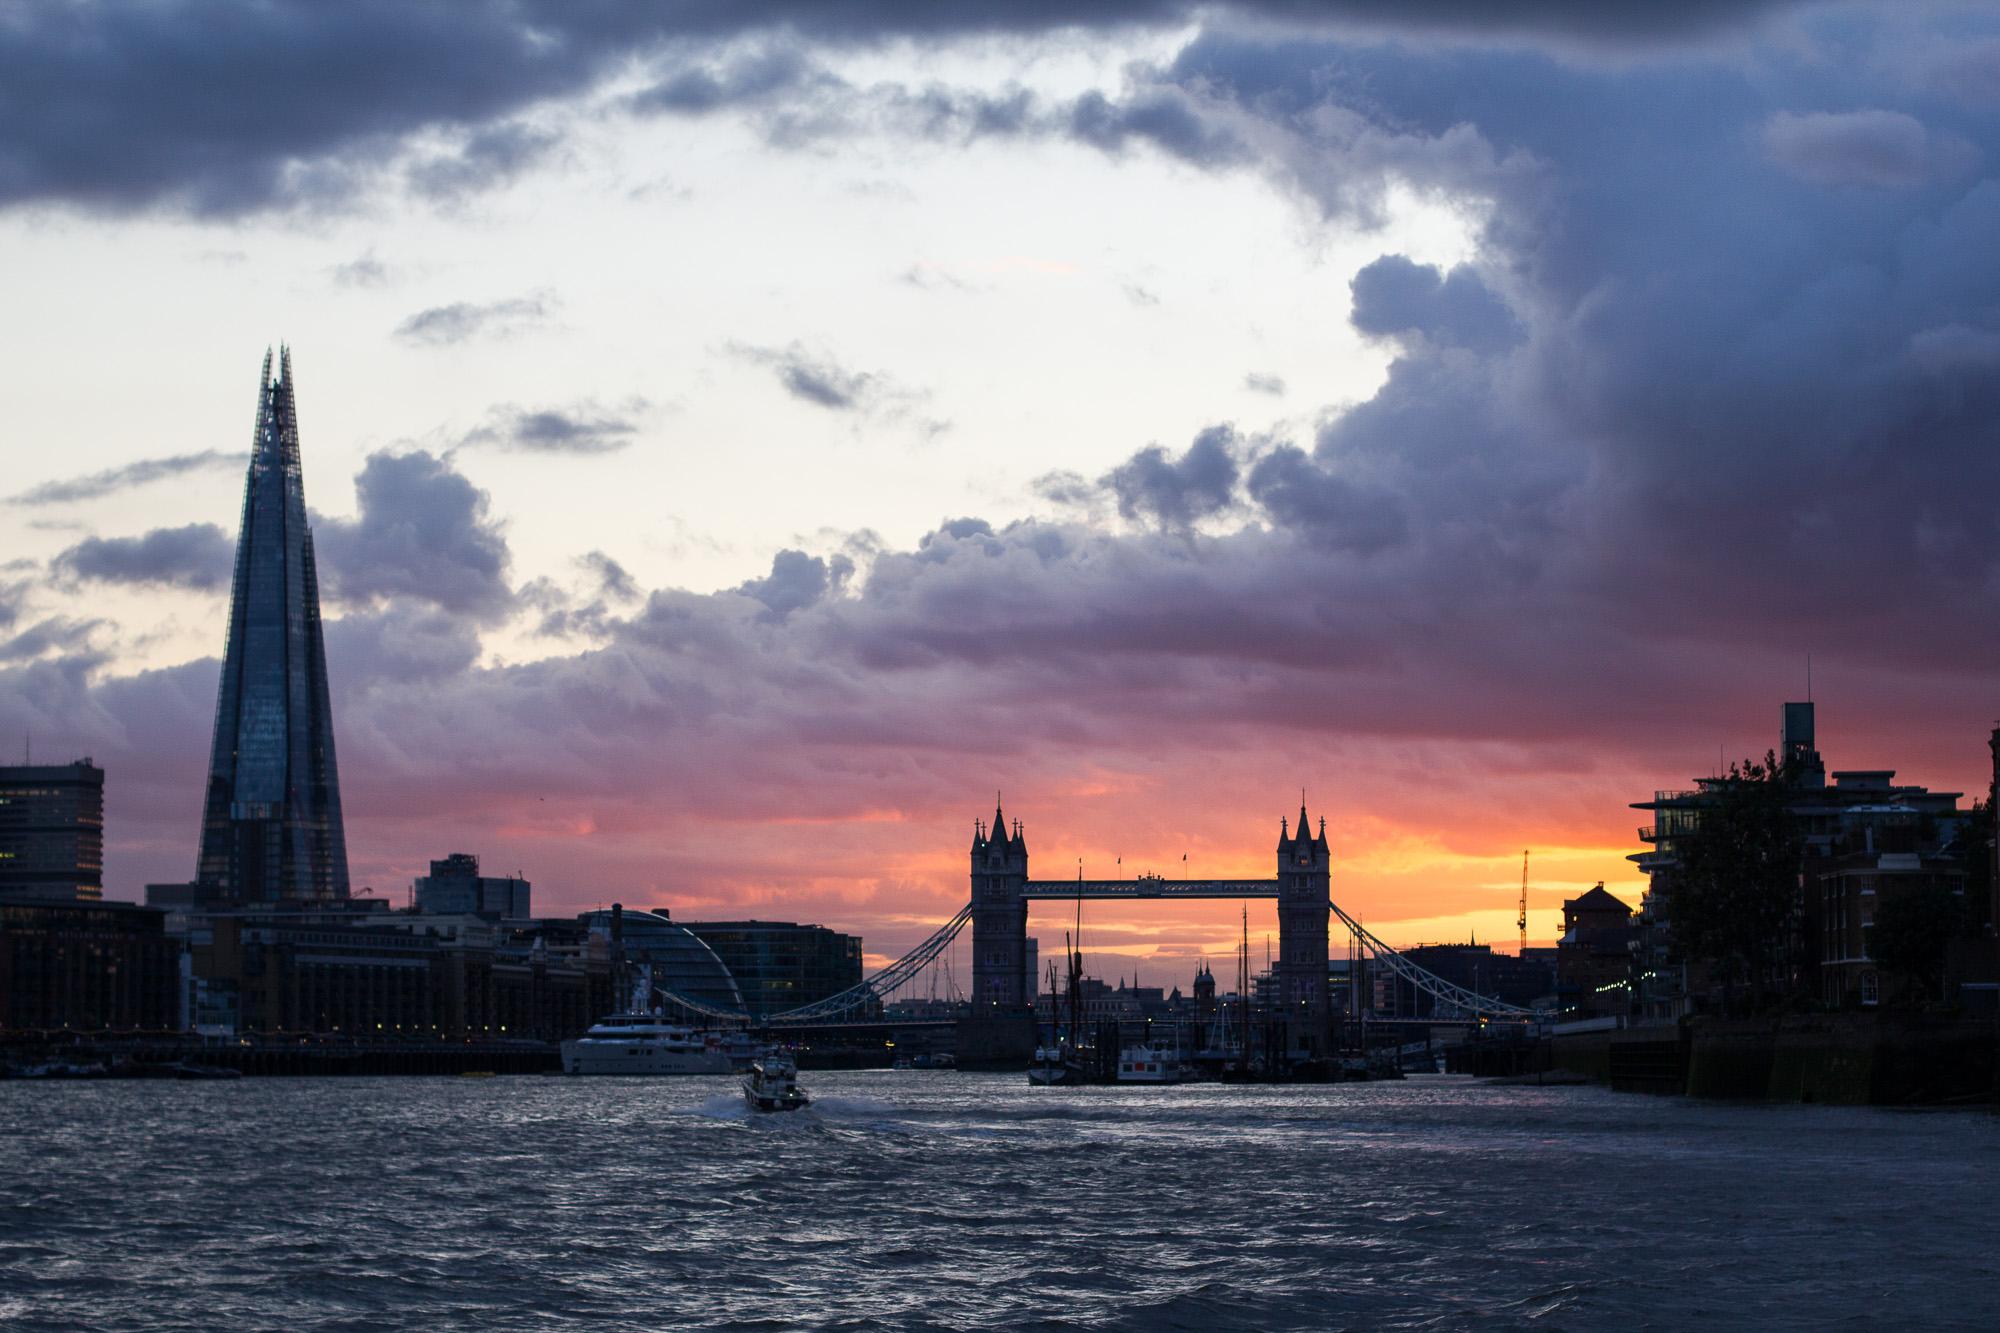 20150728-IMG_4841-London2015.jpg